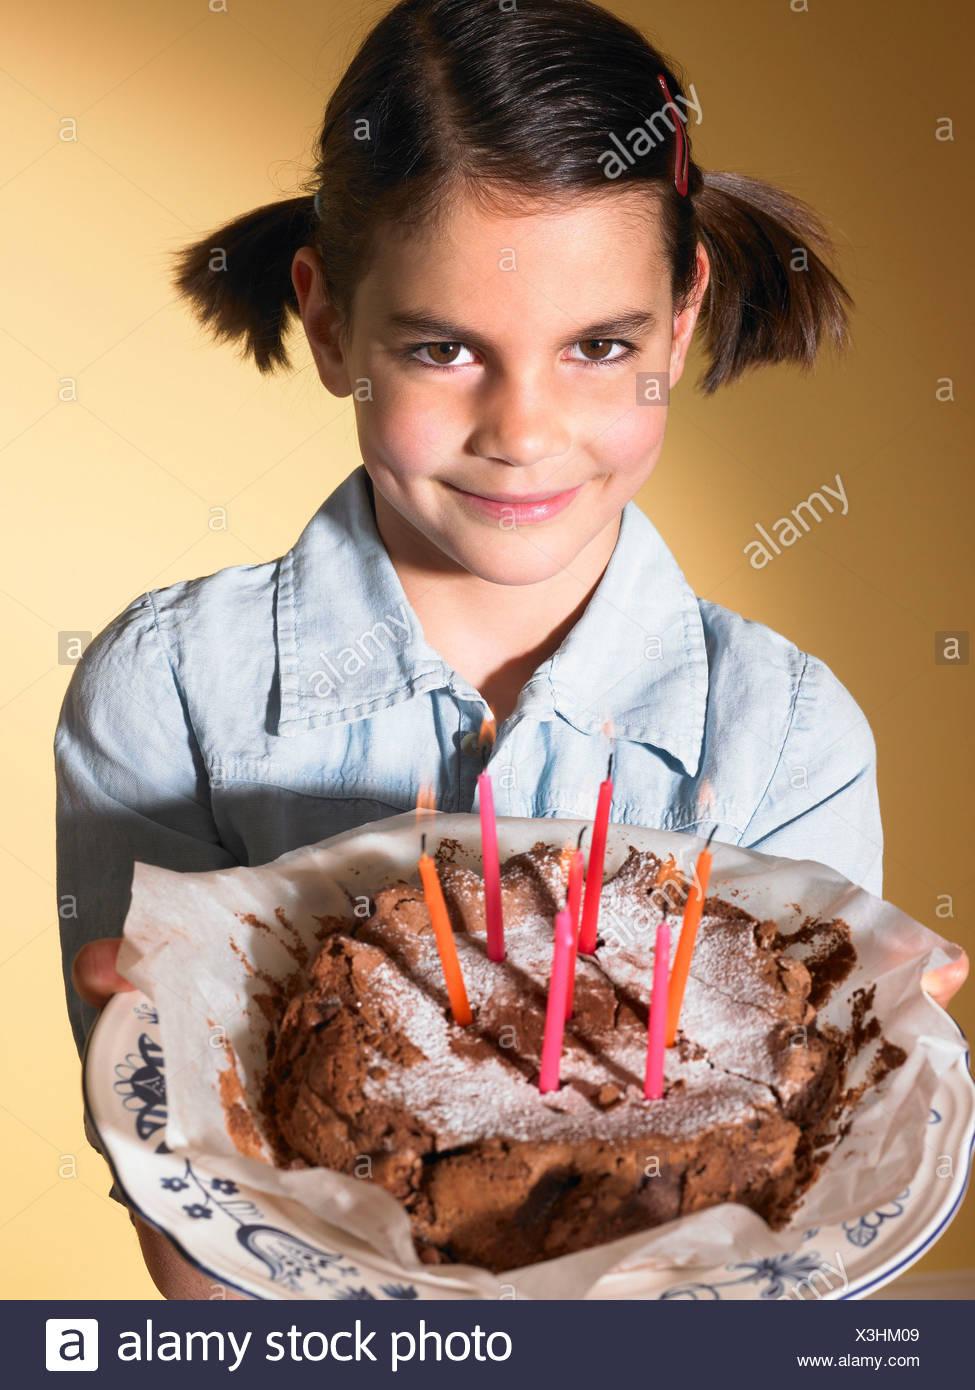 Girl holding a birthday cake - Stock Image